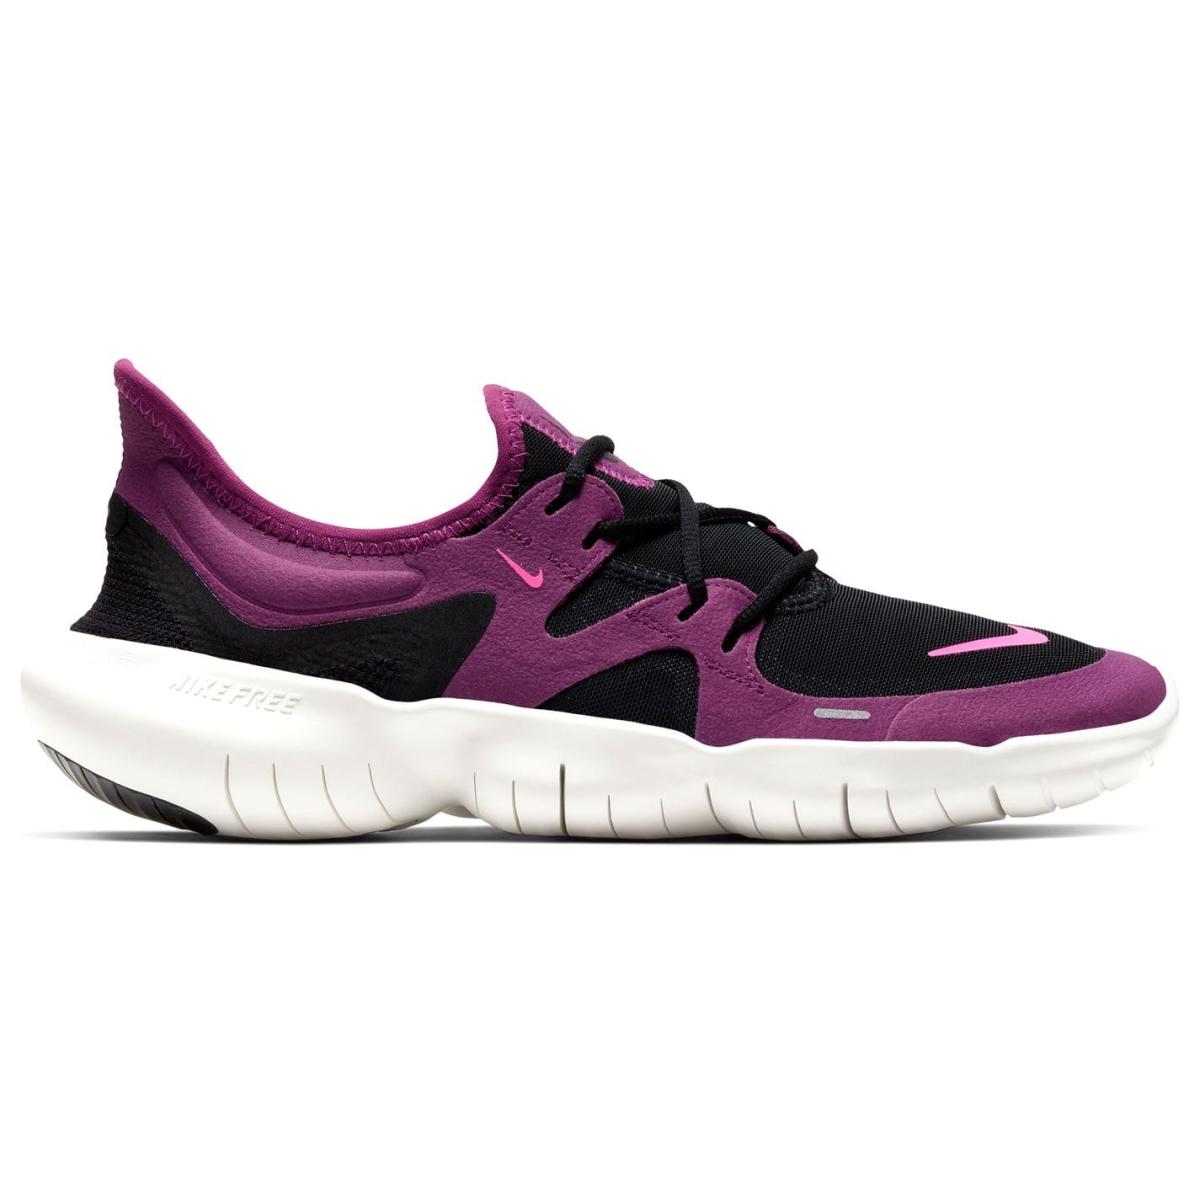 Nike-Free-Run-5-0-Turnschuhe-Damen-Sneaker-Sportschuhe-Laufschuhe-4923 Indexbild 9